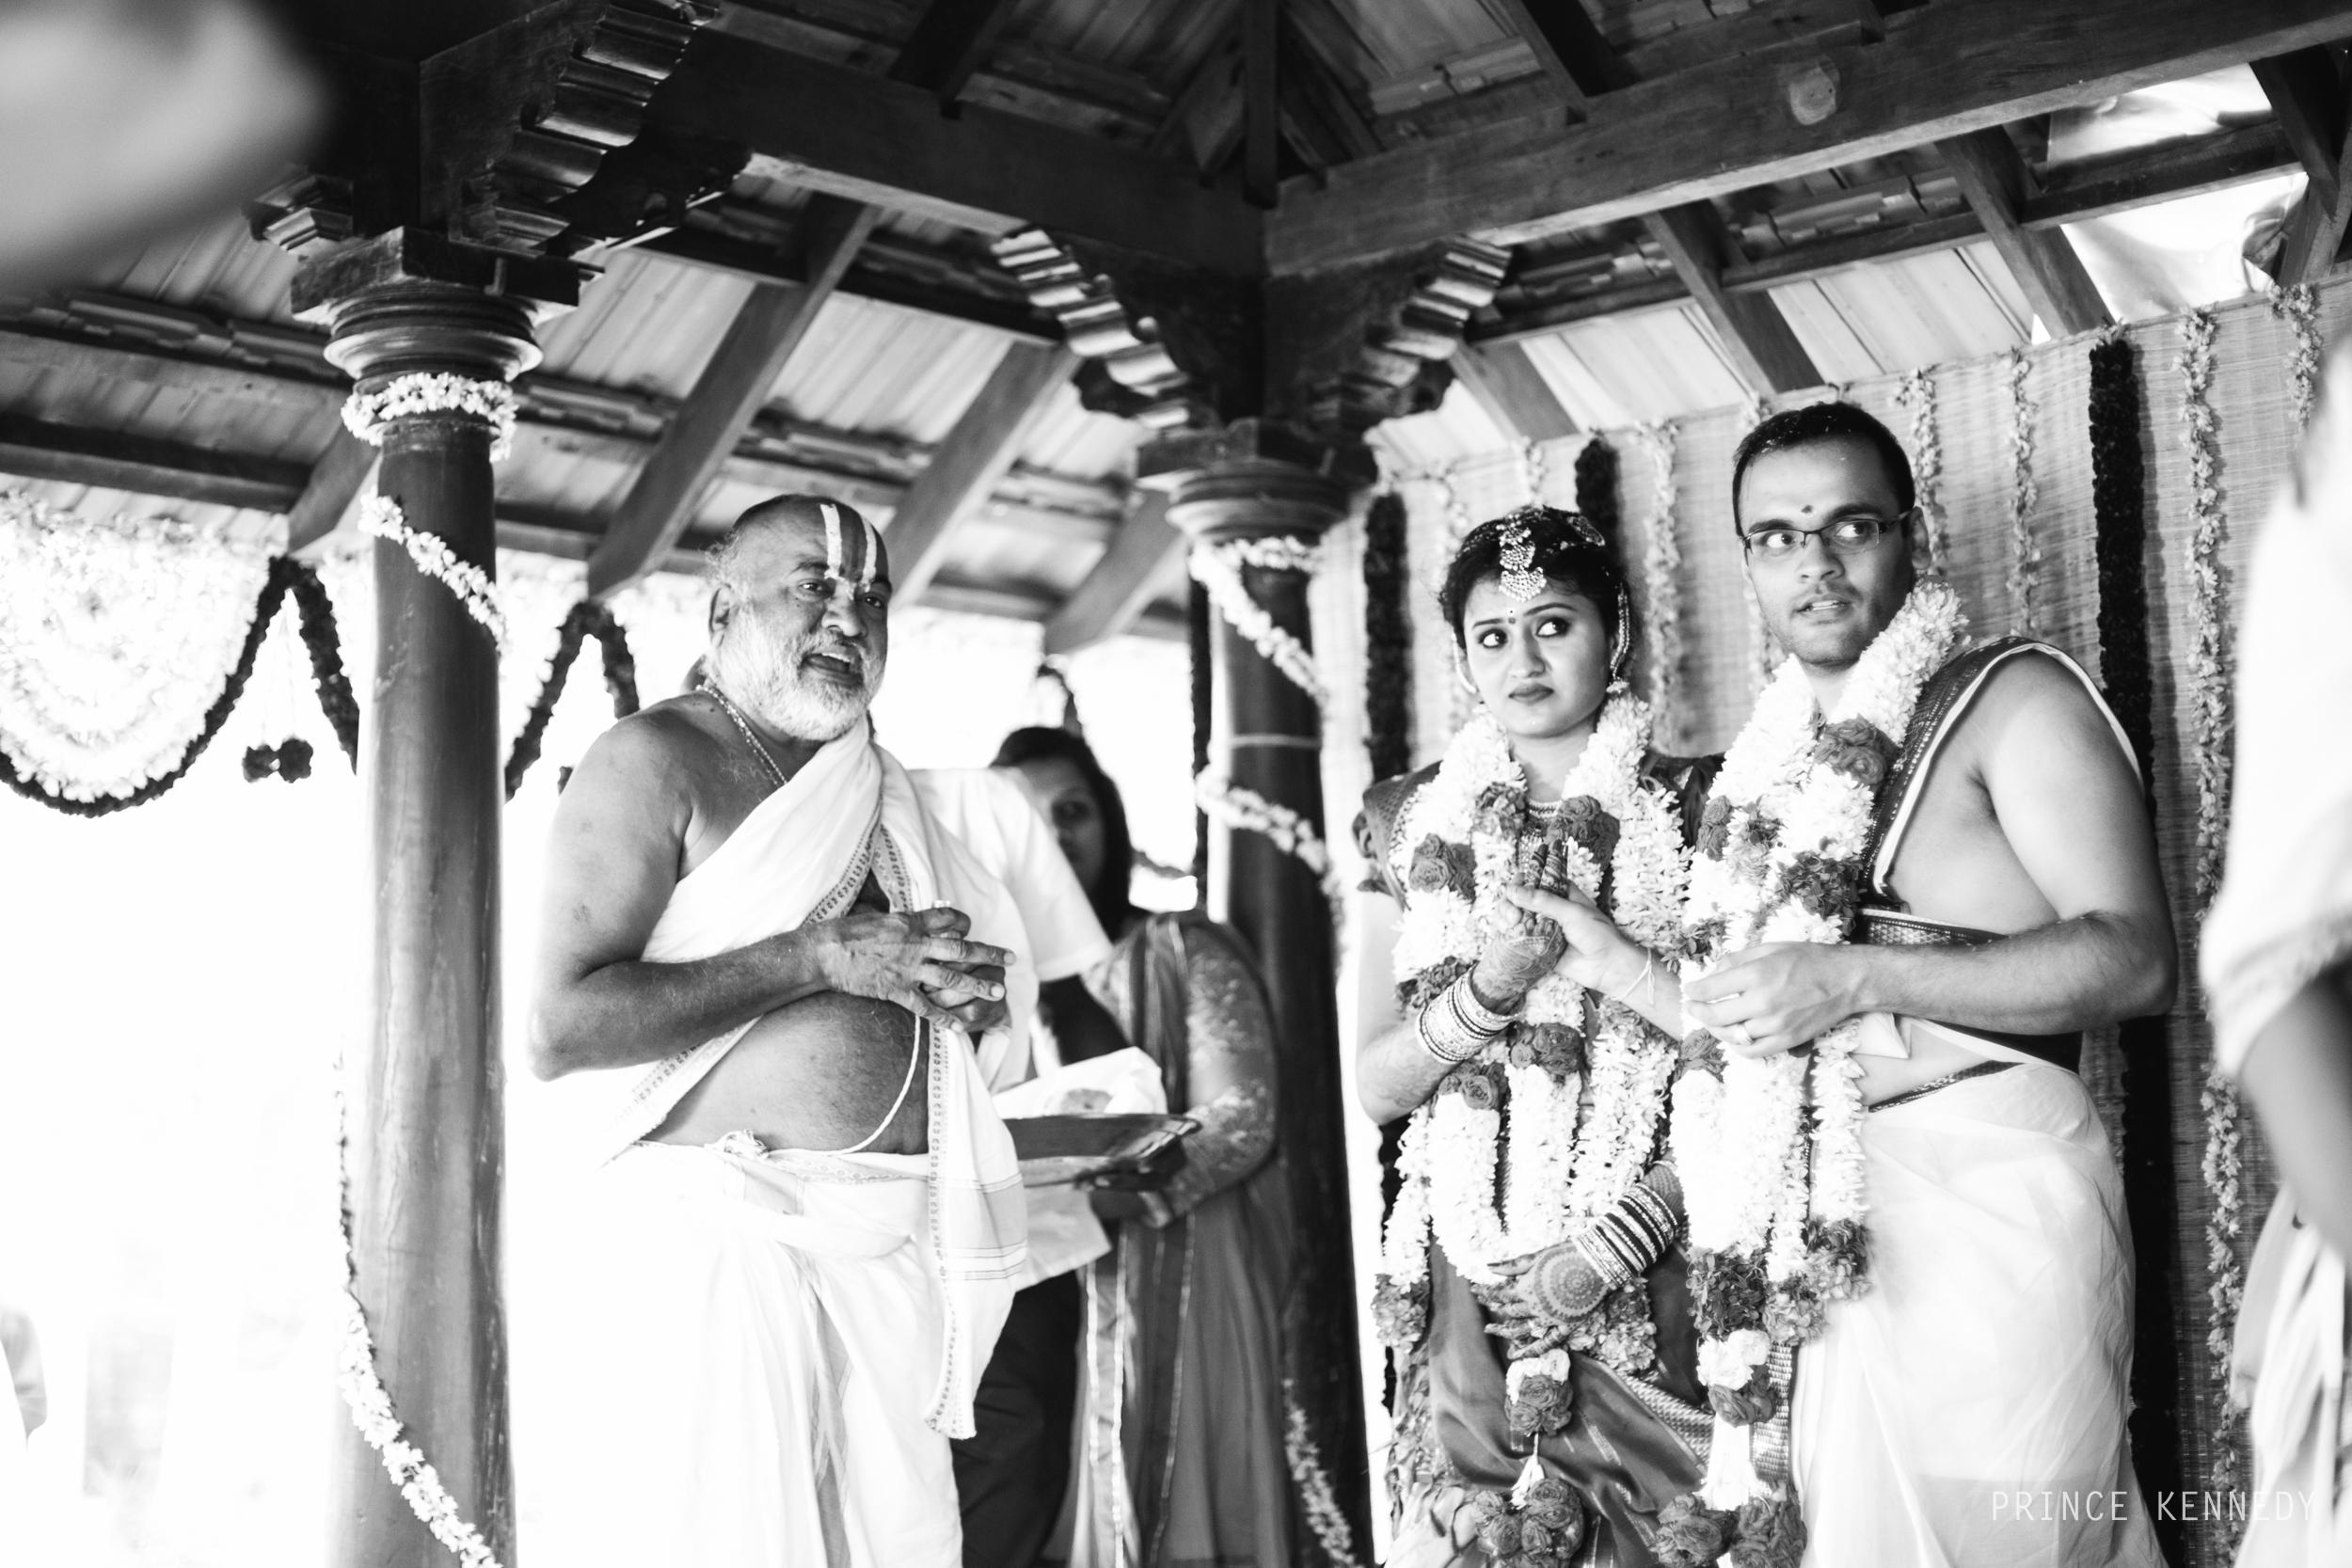 Athmajja-Nithesh-Engagement-Couple-Portrait-Portraiture-Wedding-Couple-Portrait-Chennai-Photographer-Candid-Photography-Destination-Best-Prince-Kennedy-Photography-338.jpg